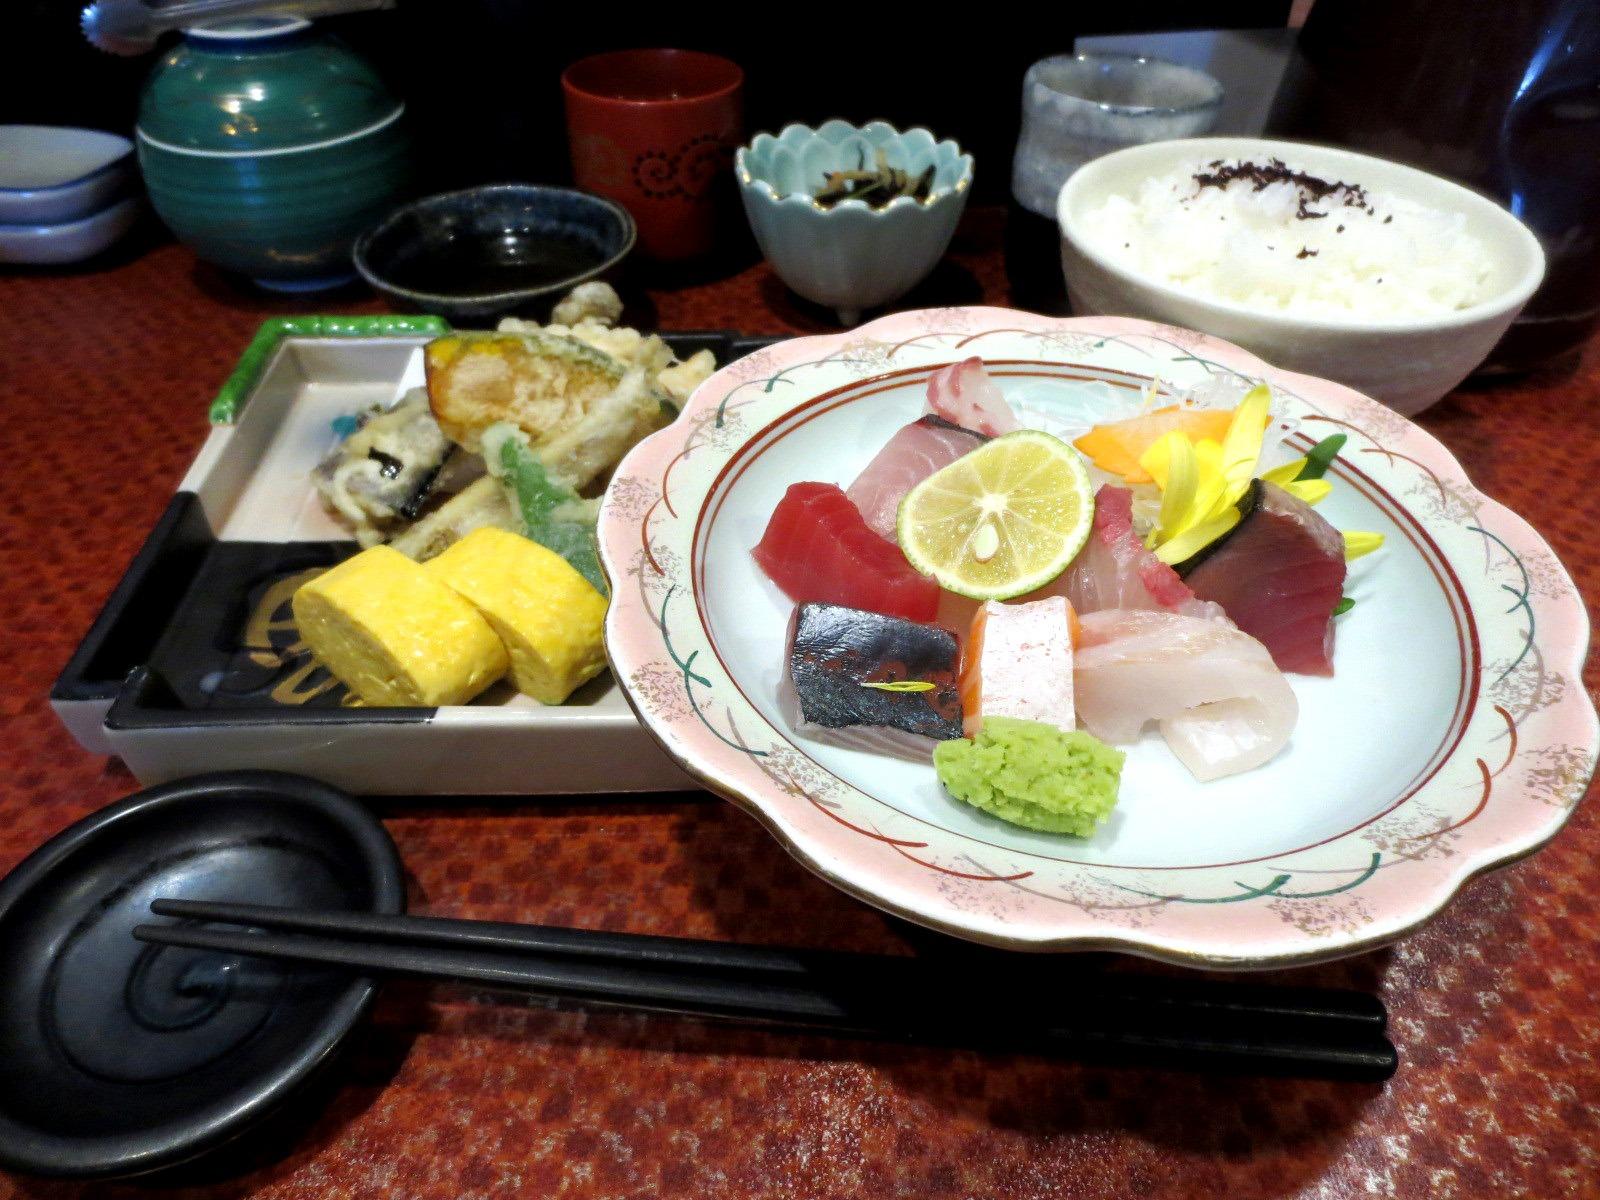 天王寺・上本町 魚料理が ... - ozmall.co.jp